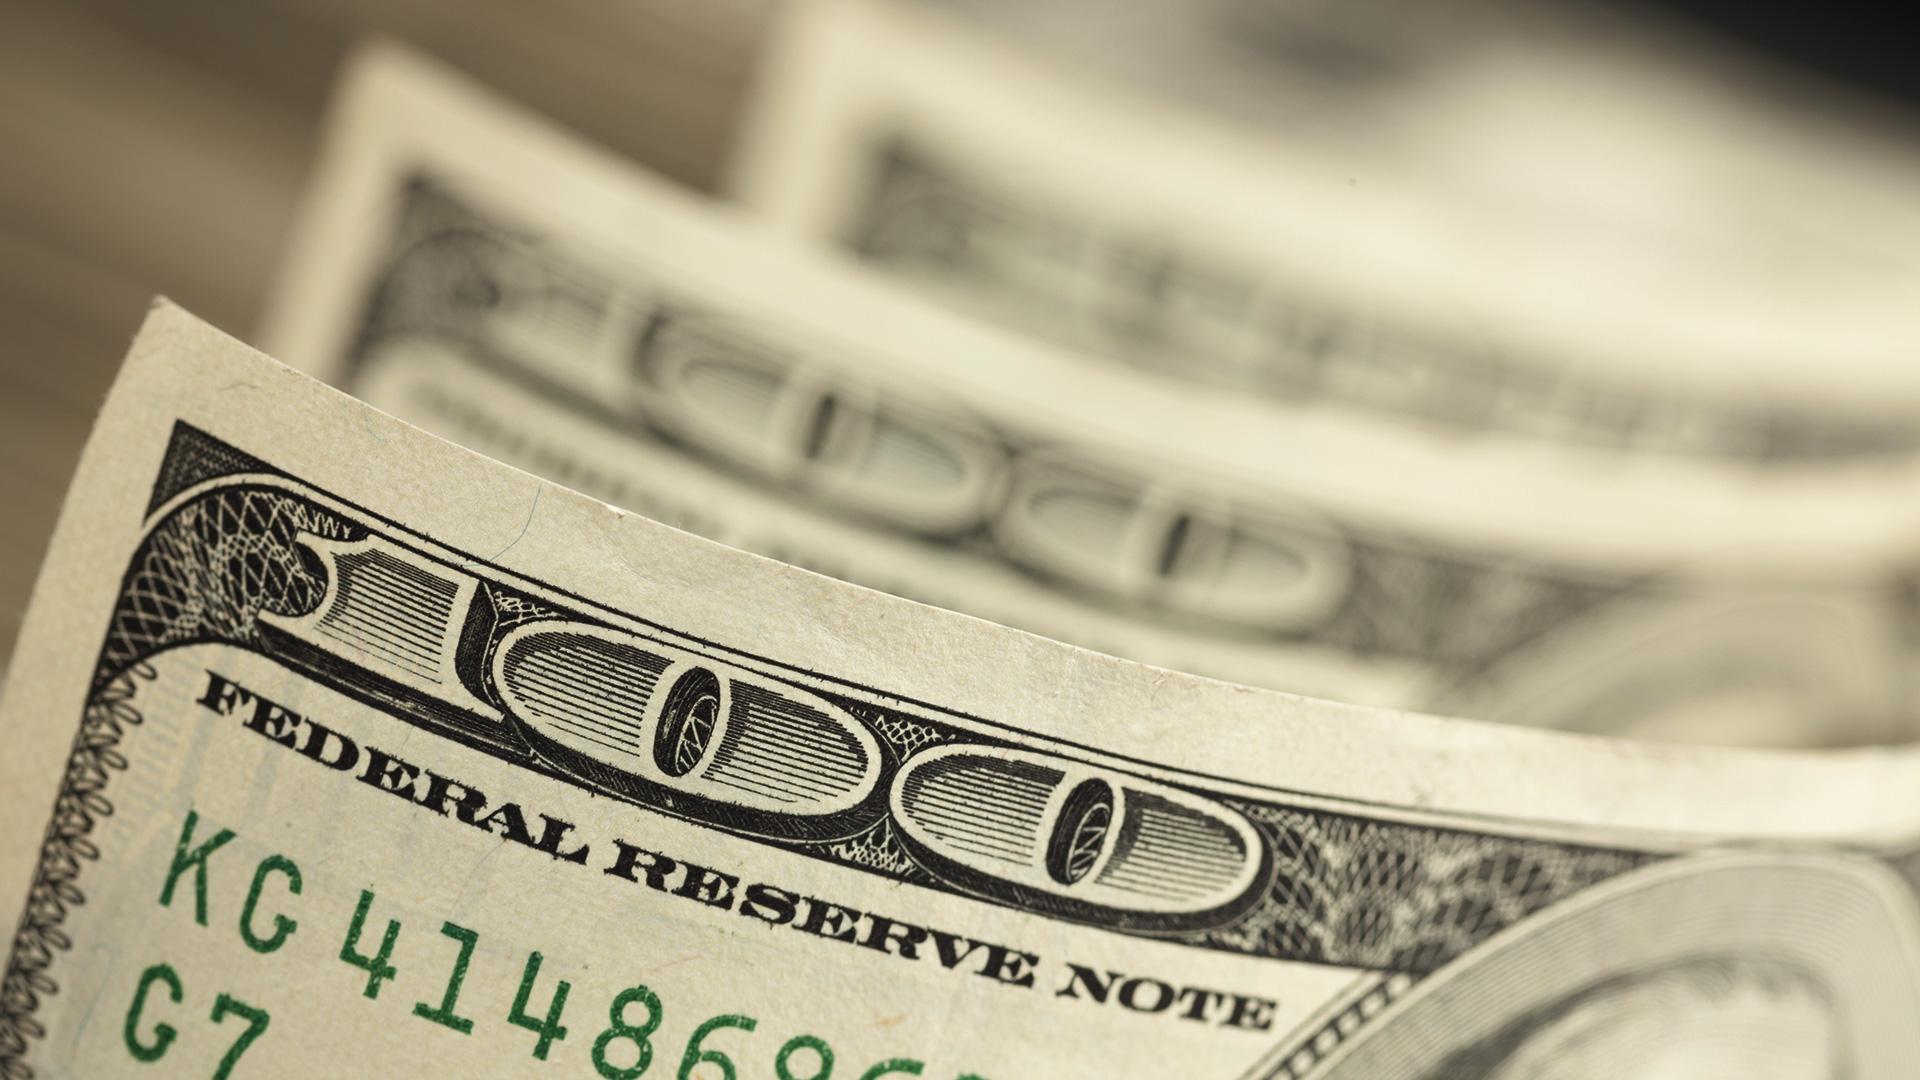 TUSD привлёк $20 млн. инвестиций